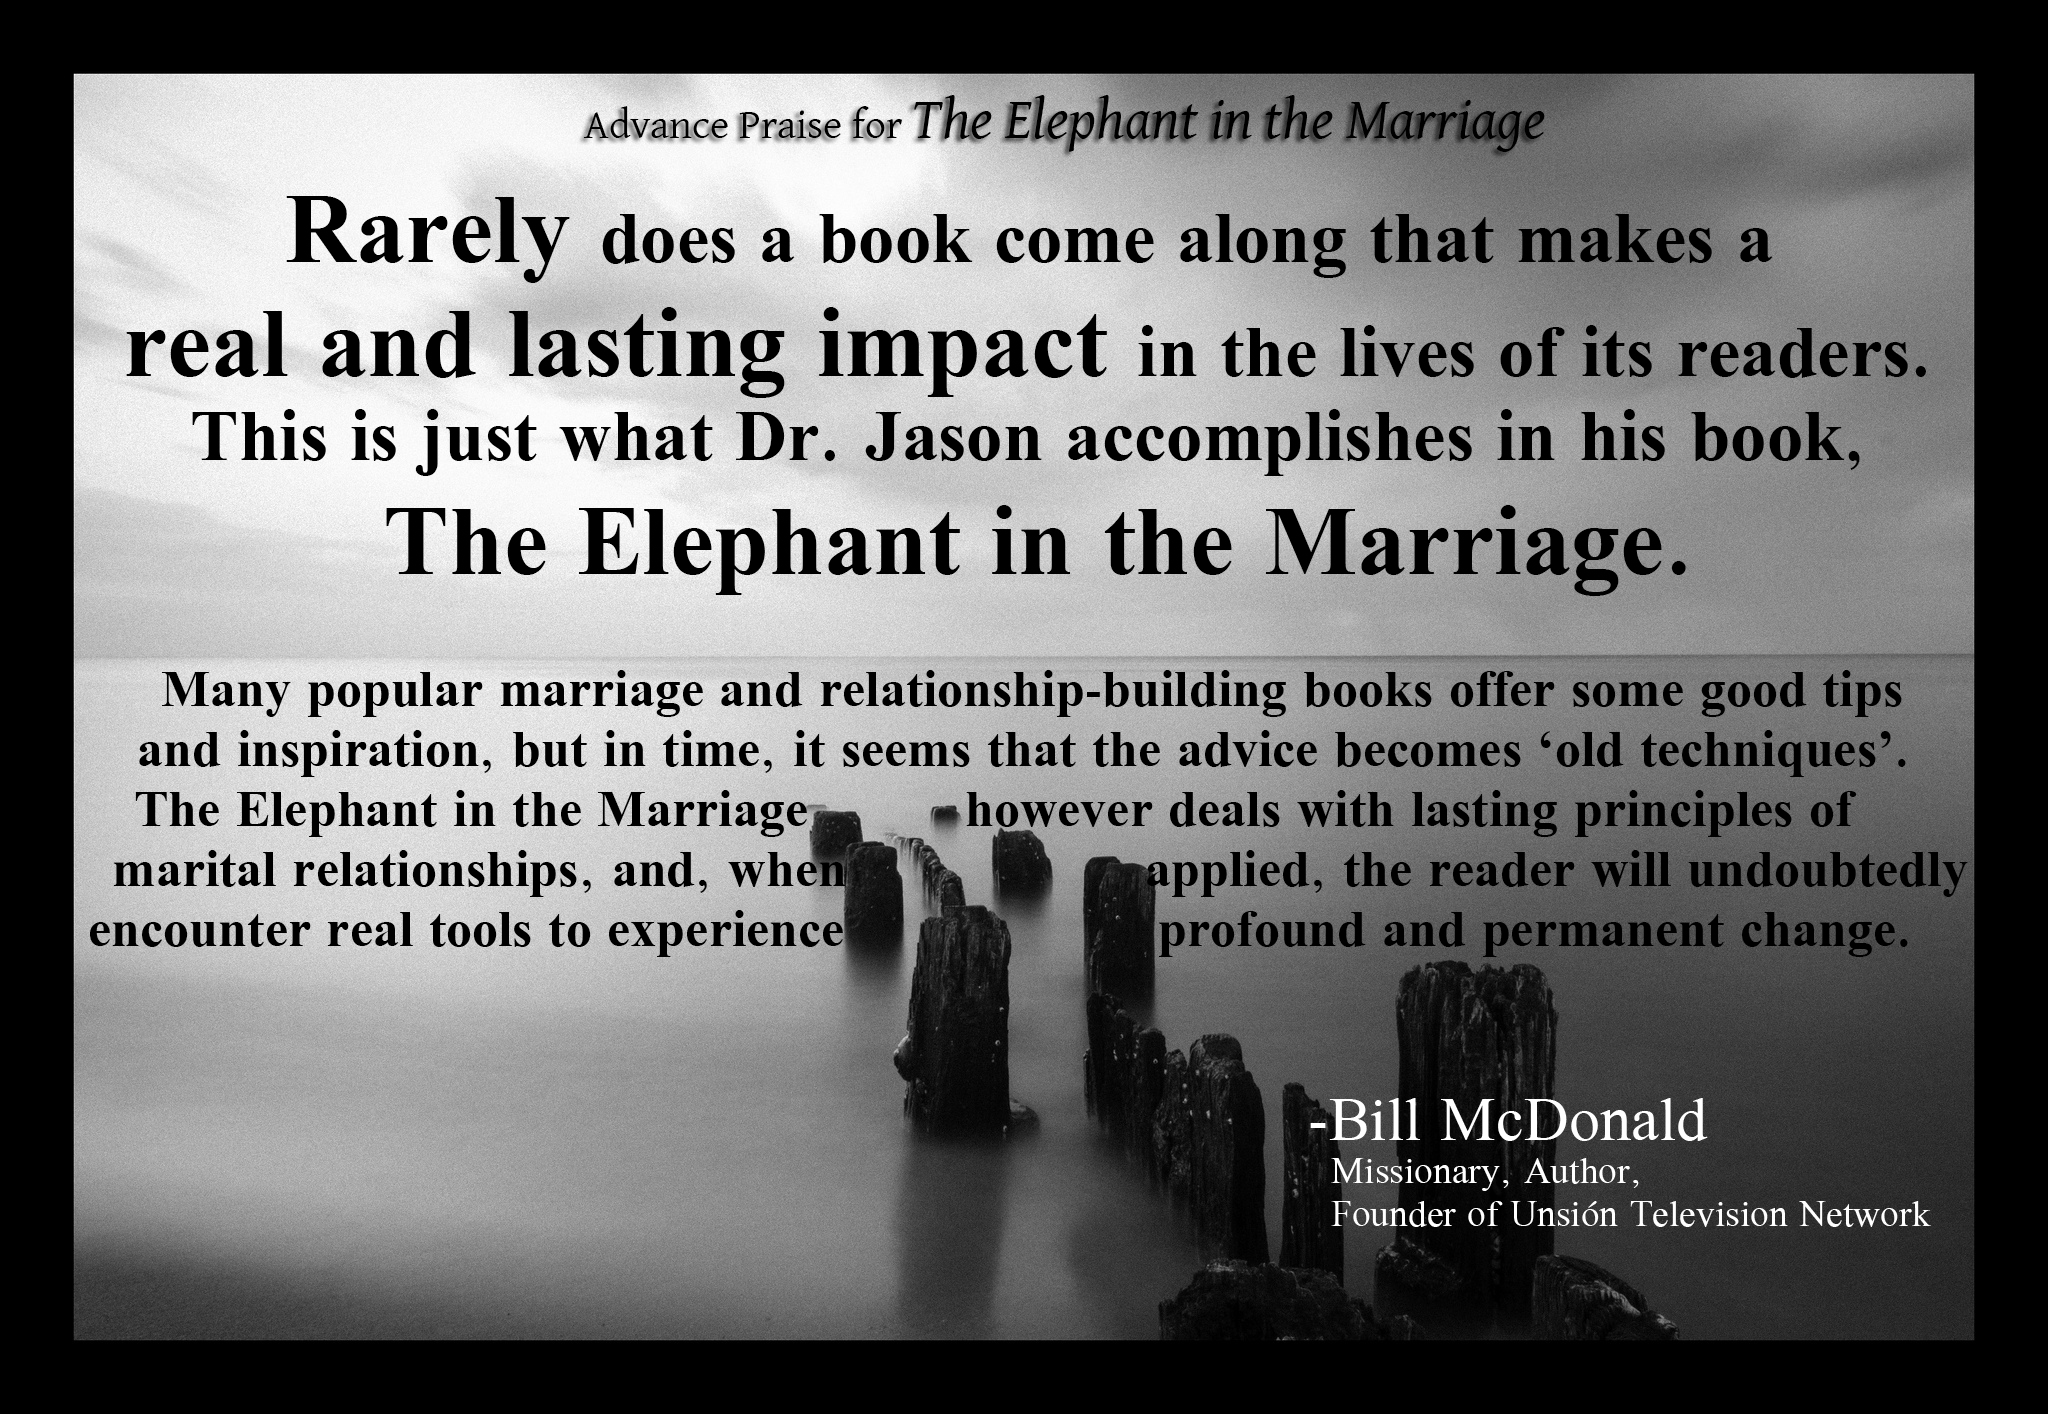 Advance Praise Bill McDonald